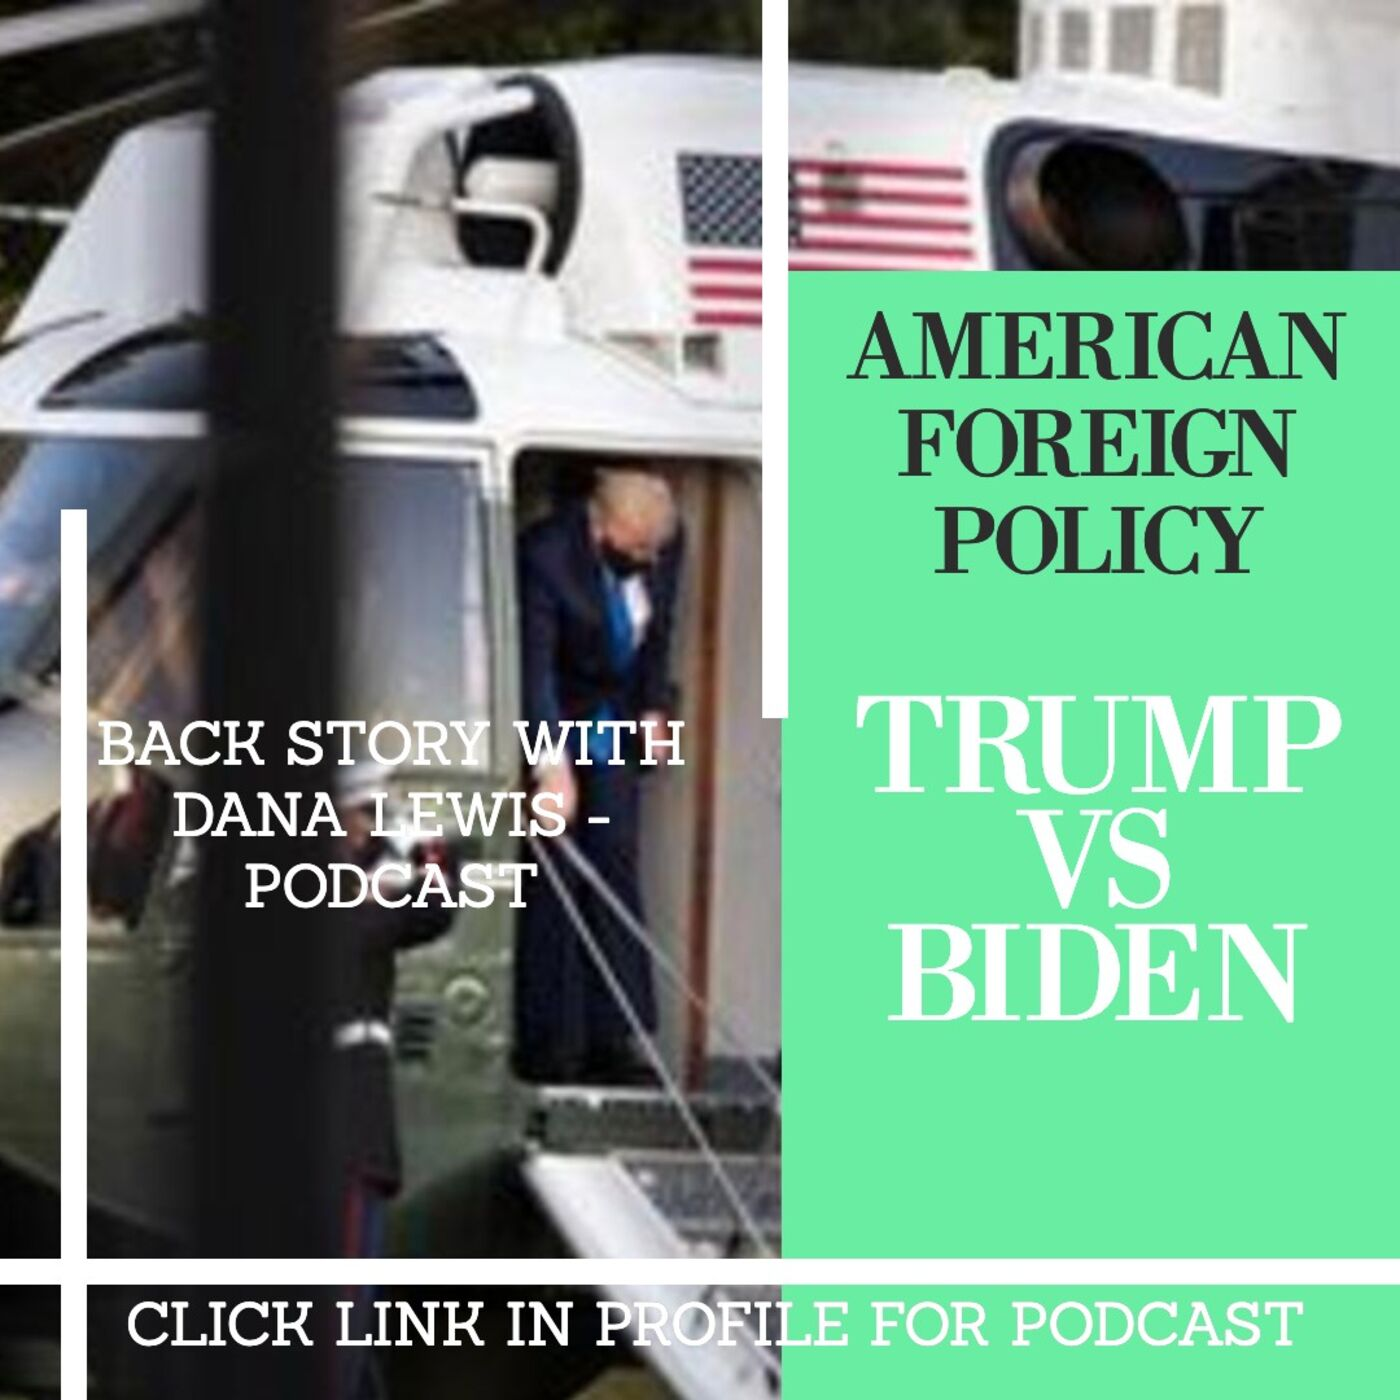 AMERICAN FOREIGN POLICY; BIDEN VS TRUMP